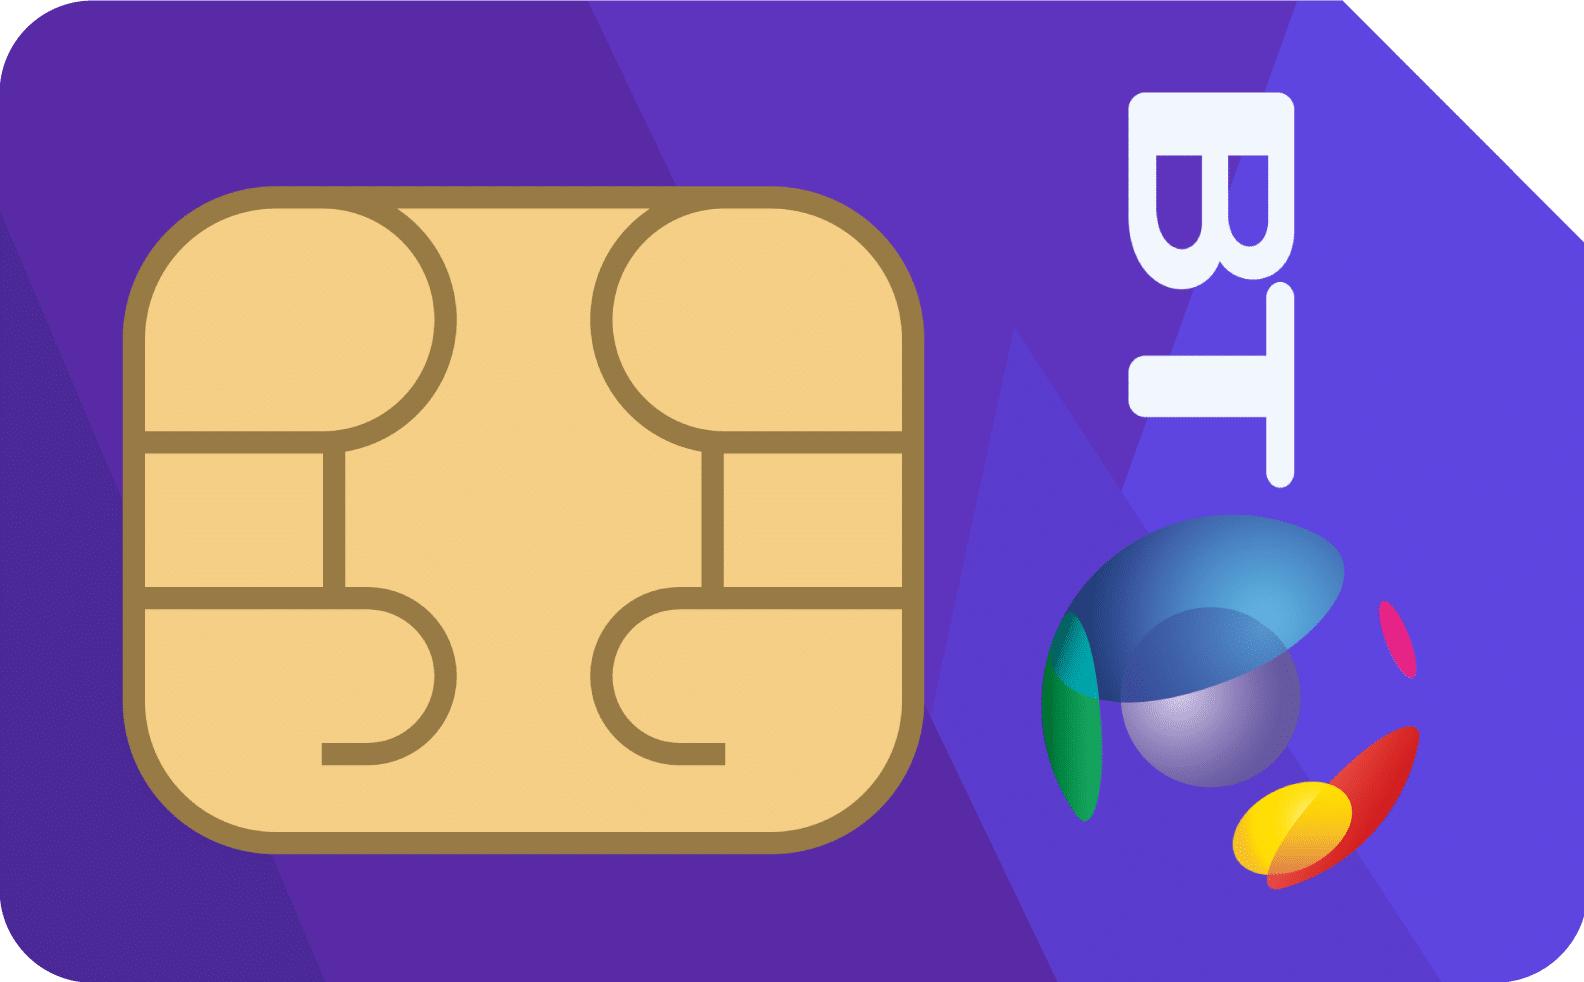 Reduced BT sim 12 month contracts £15 for 20GB/UM/UT + Mastercard reward card + Speaker worth £119 + BT Sport App @ BT (BT Broadband users)